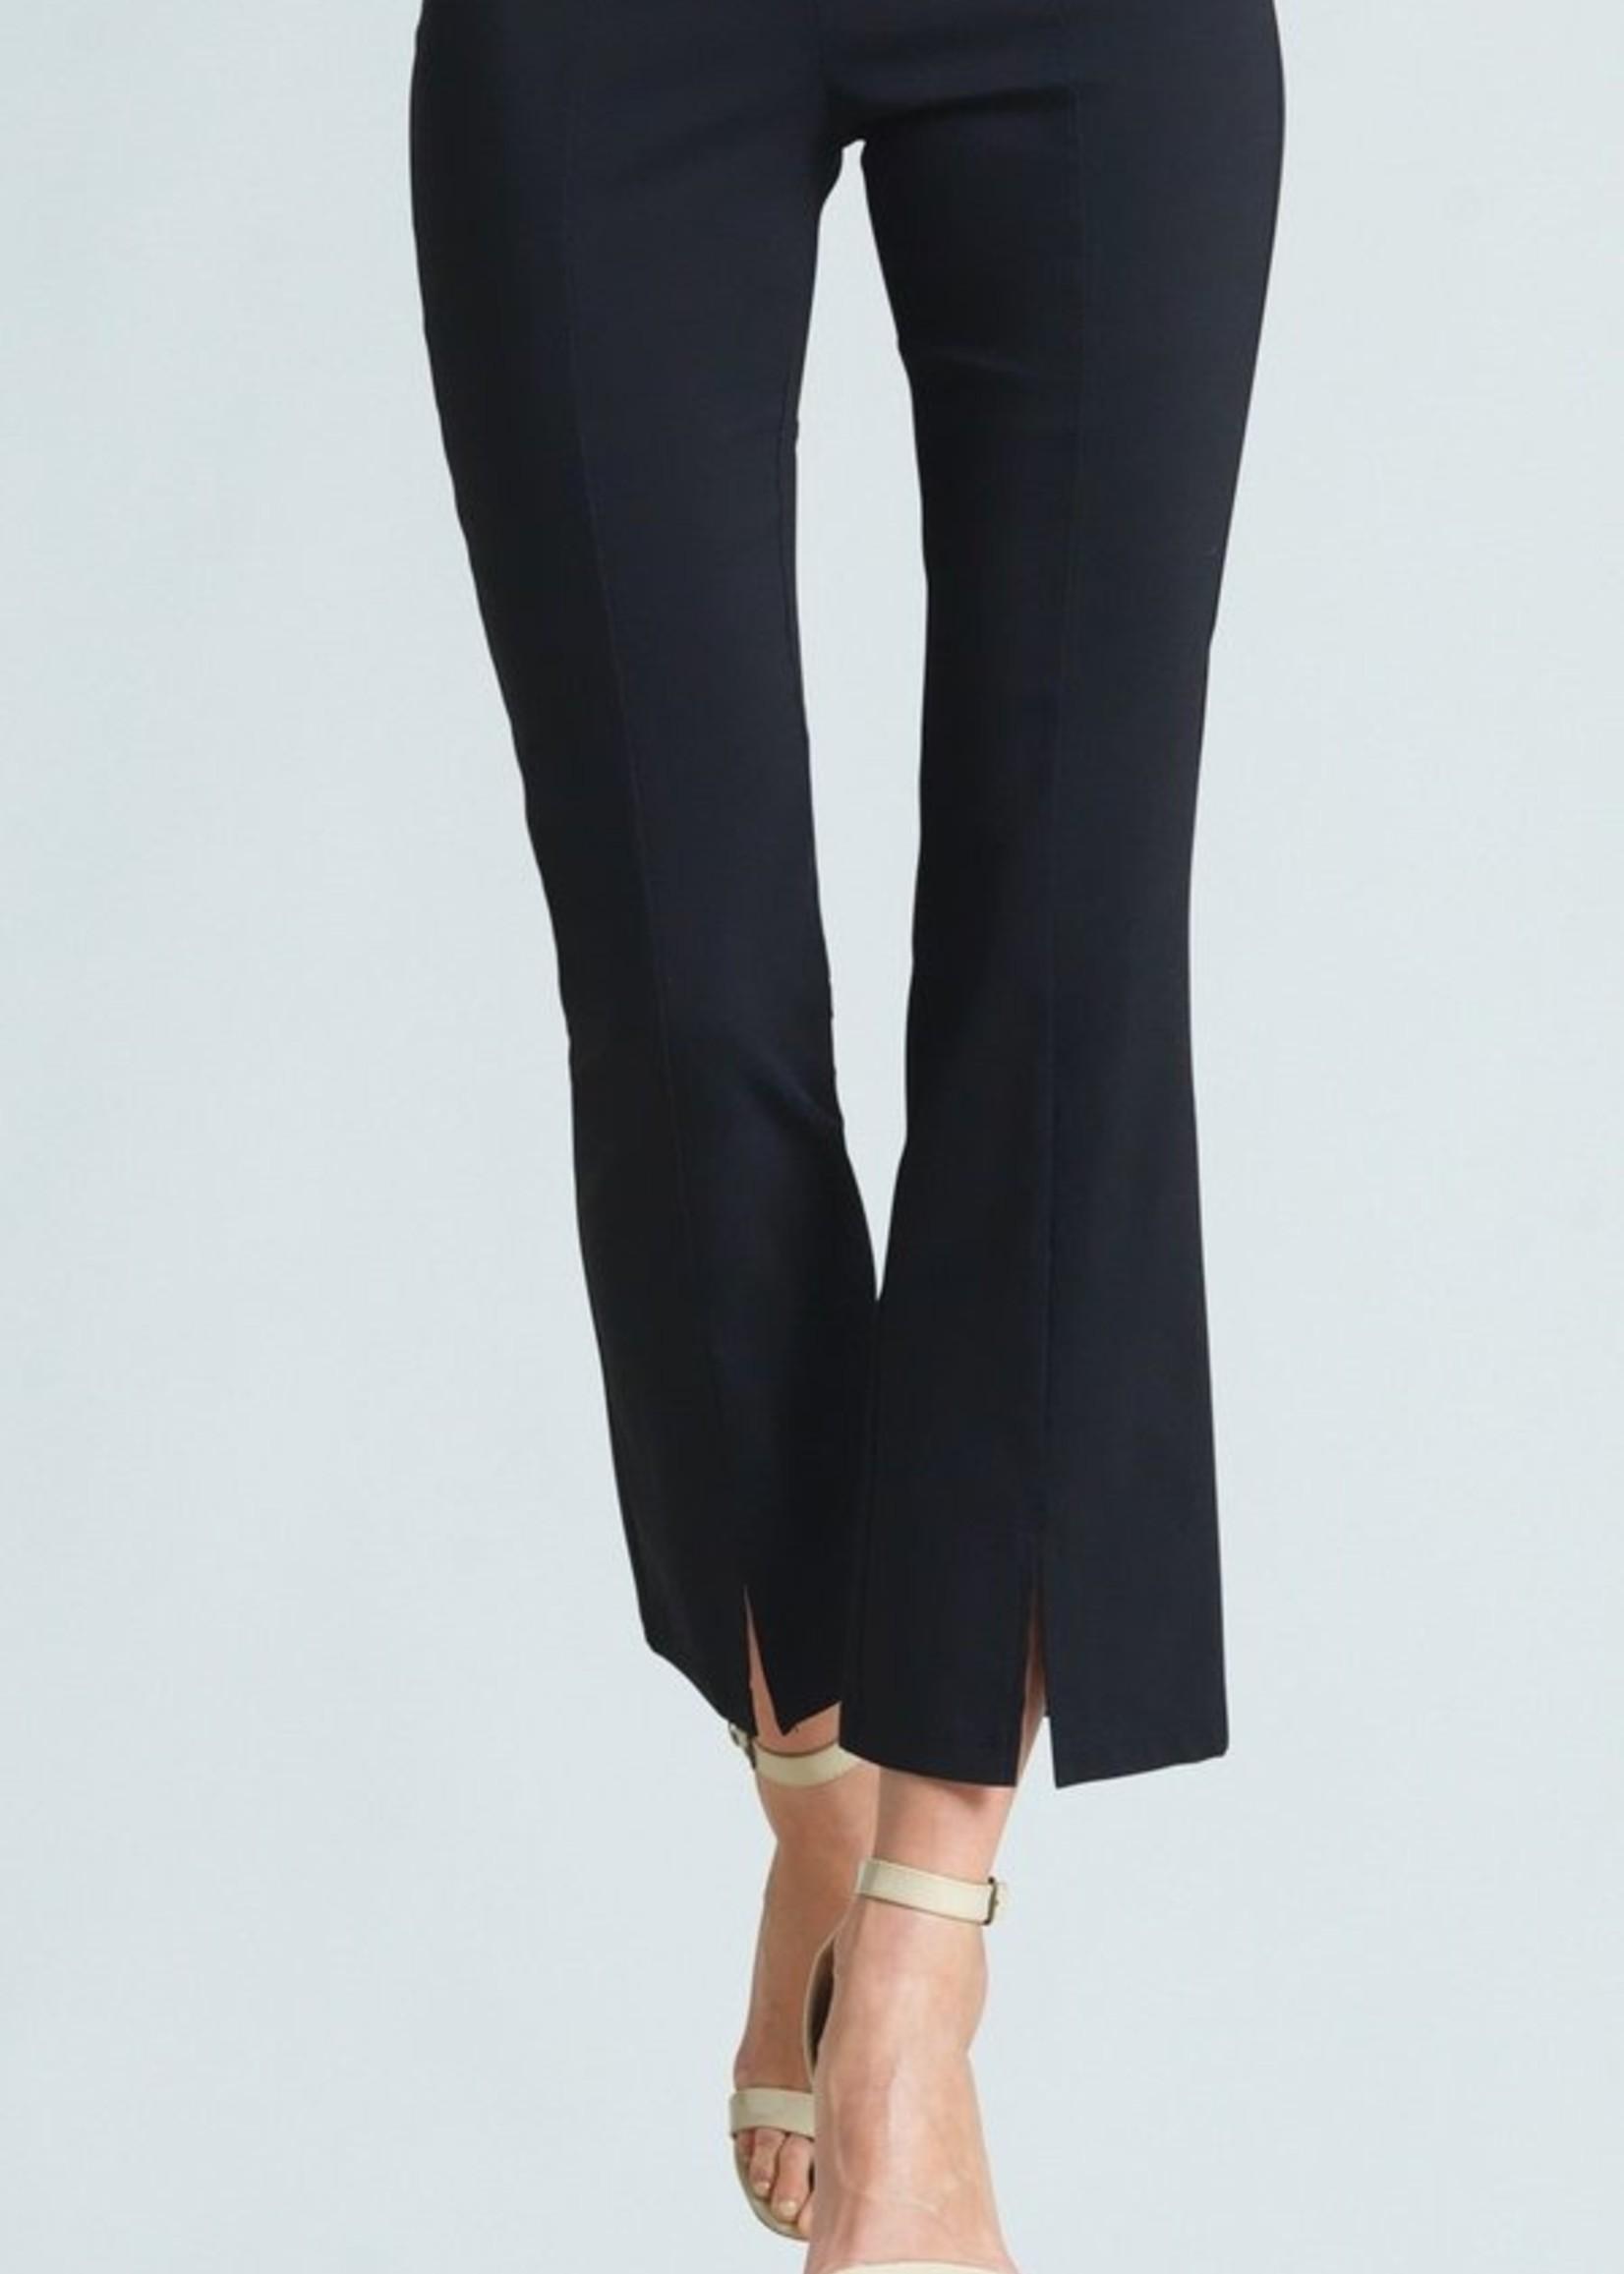 Clara Sunwoo Clara Sunwoo Denim Center Seam Pull On Pants